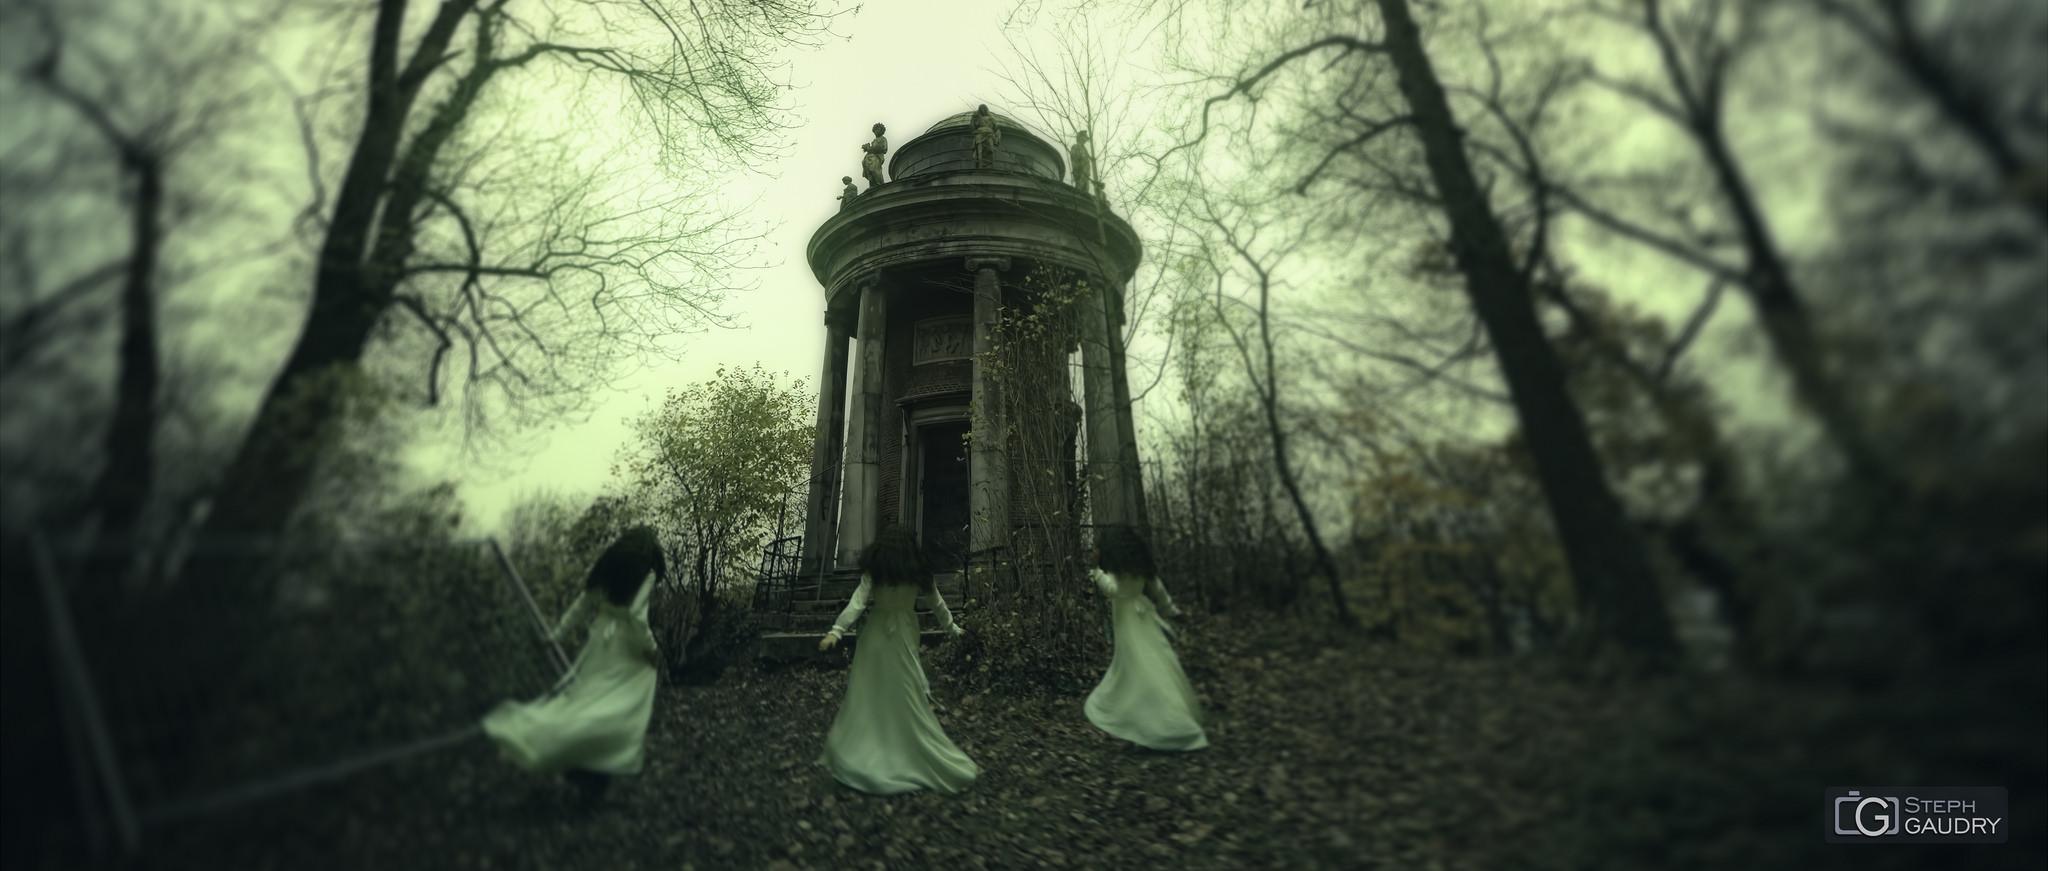 Les filles de Kronos - cinemascope [Click to start slideshow]